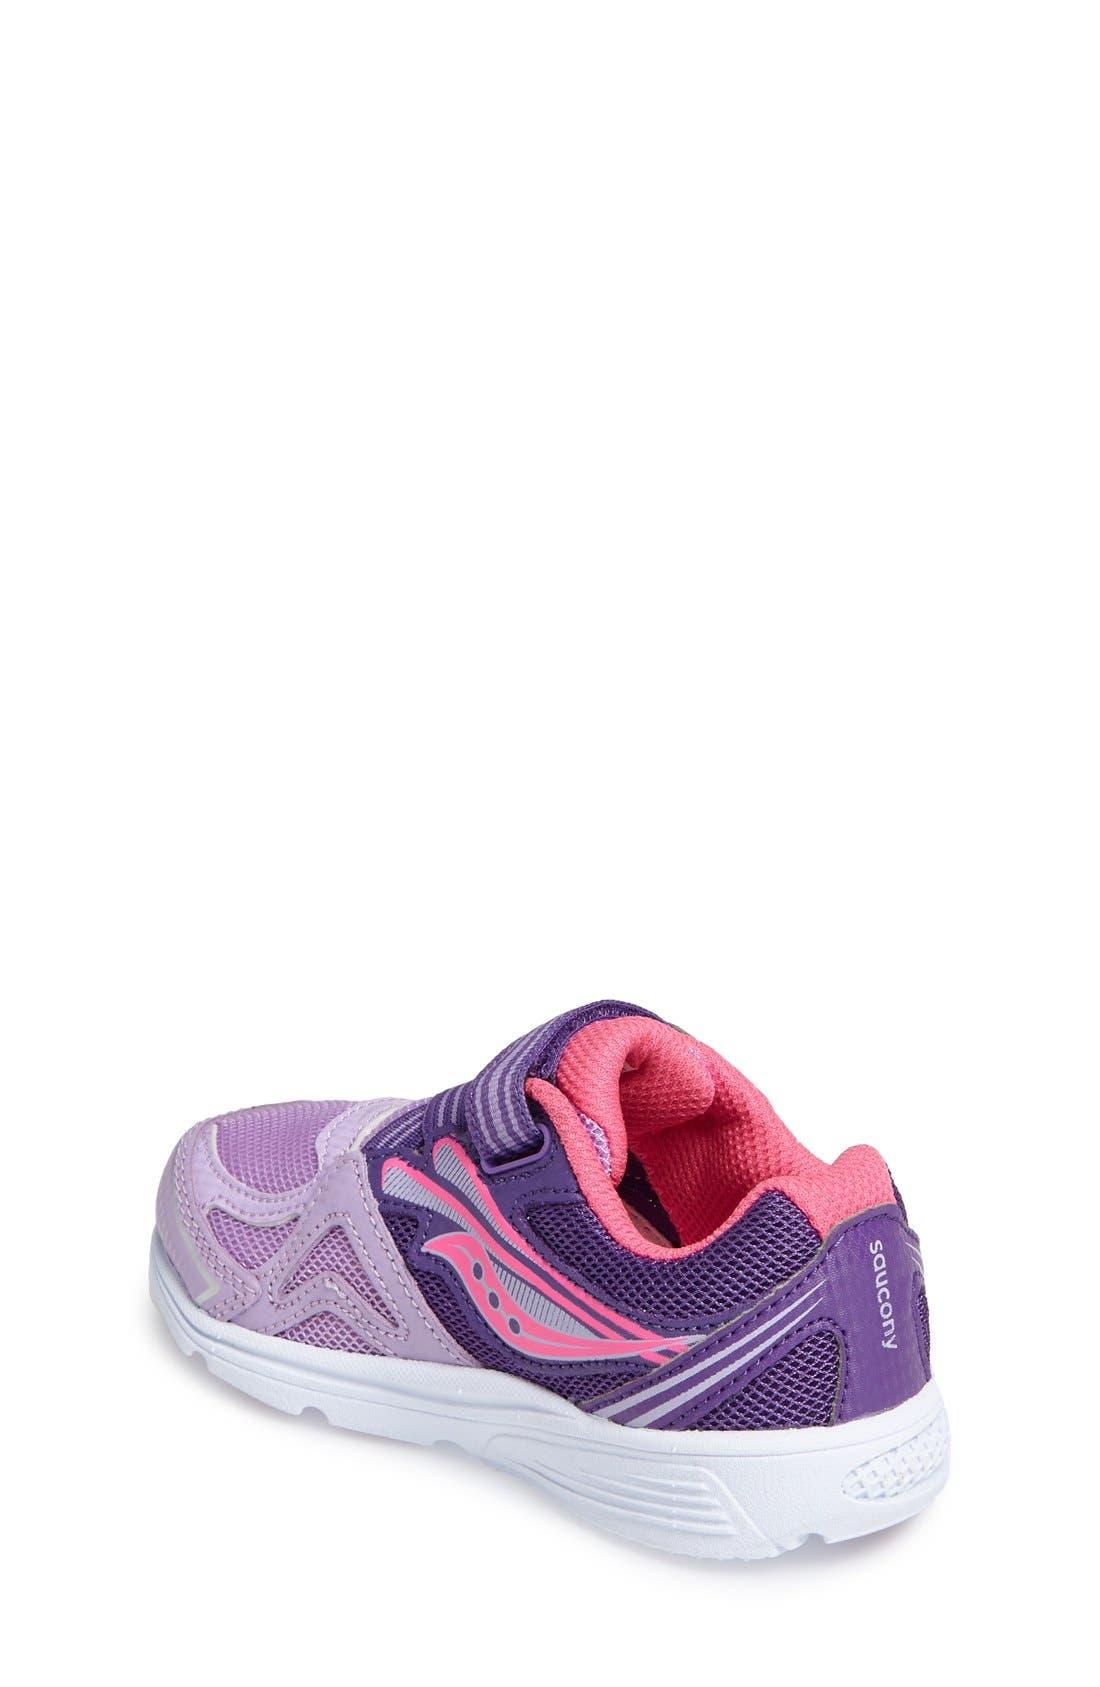 Baby Ride Sneaker,                             Alternate thumbnail 2, color,                             Purple